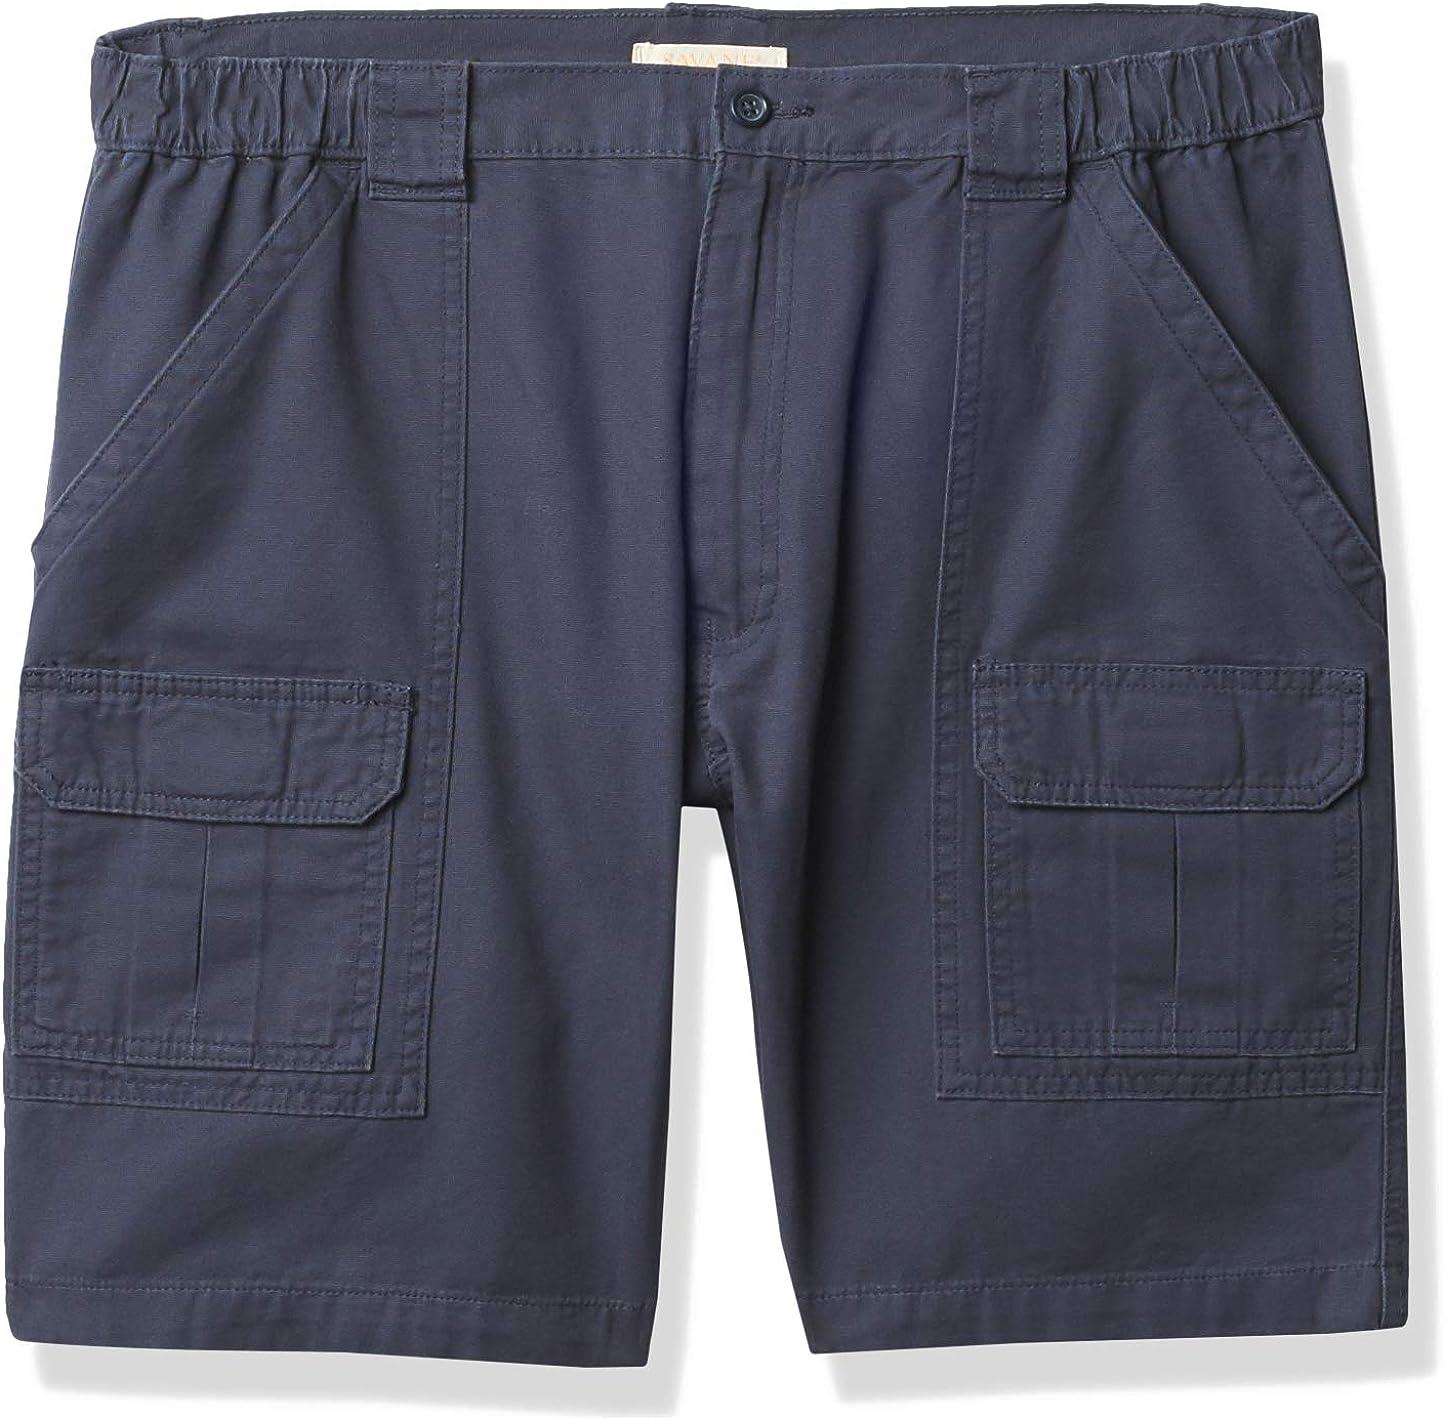 Savane Fees free!! Men's Standard Hiking Cargo Cheap SALE Start Shorts